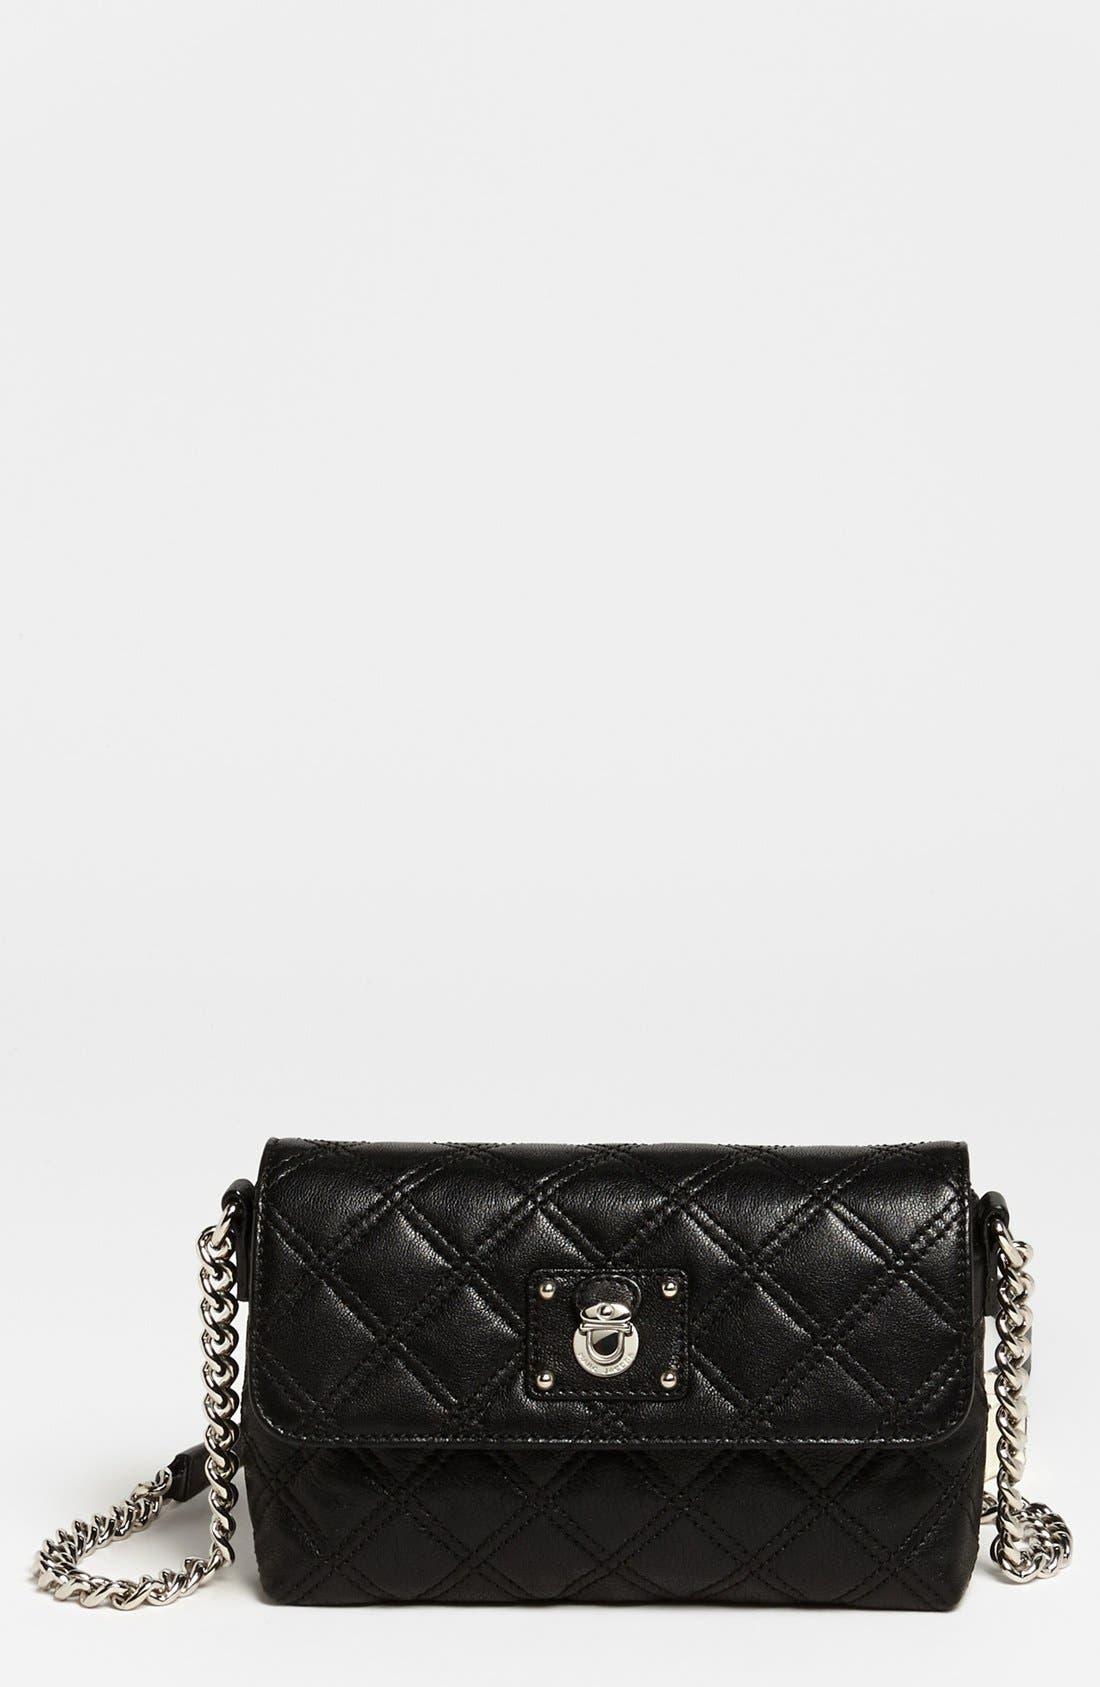 Alternate Image 1 Selected - MARC JACOBS 'Quilting - Single' Leather Shoulder Bag